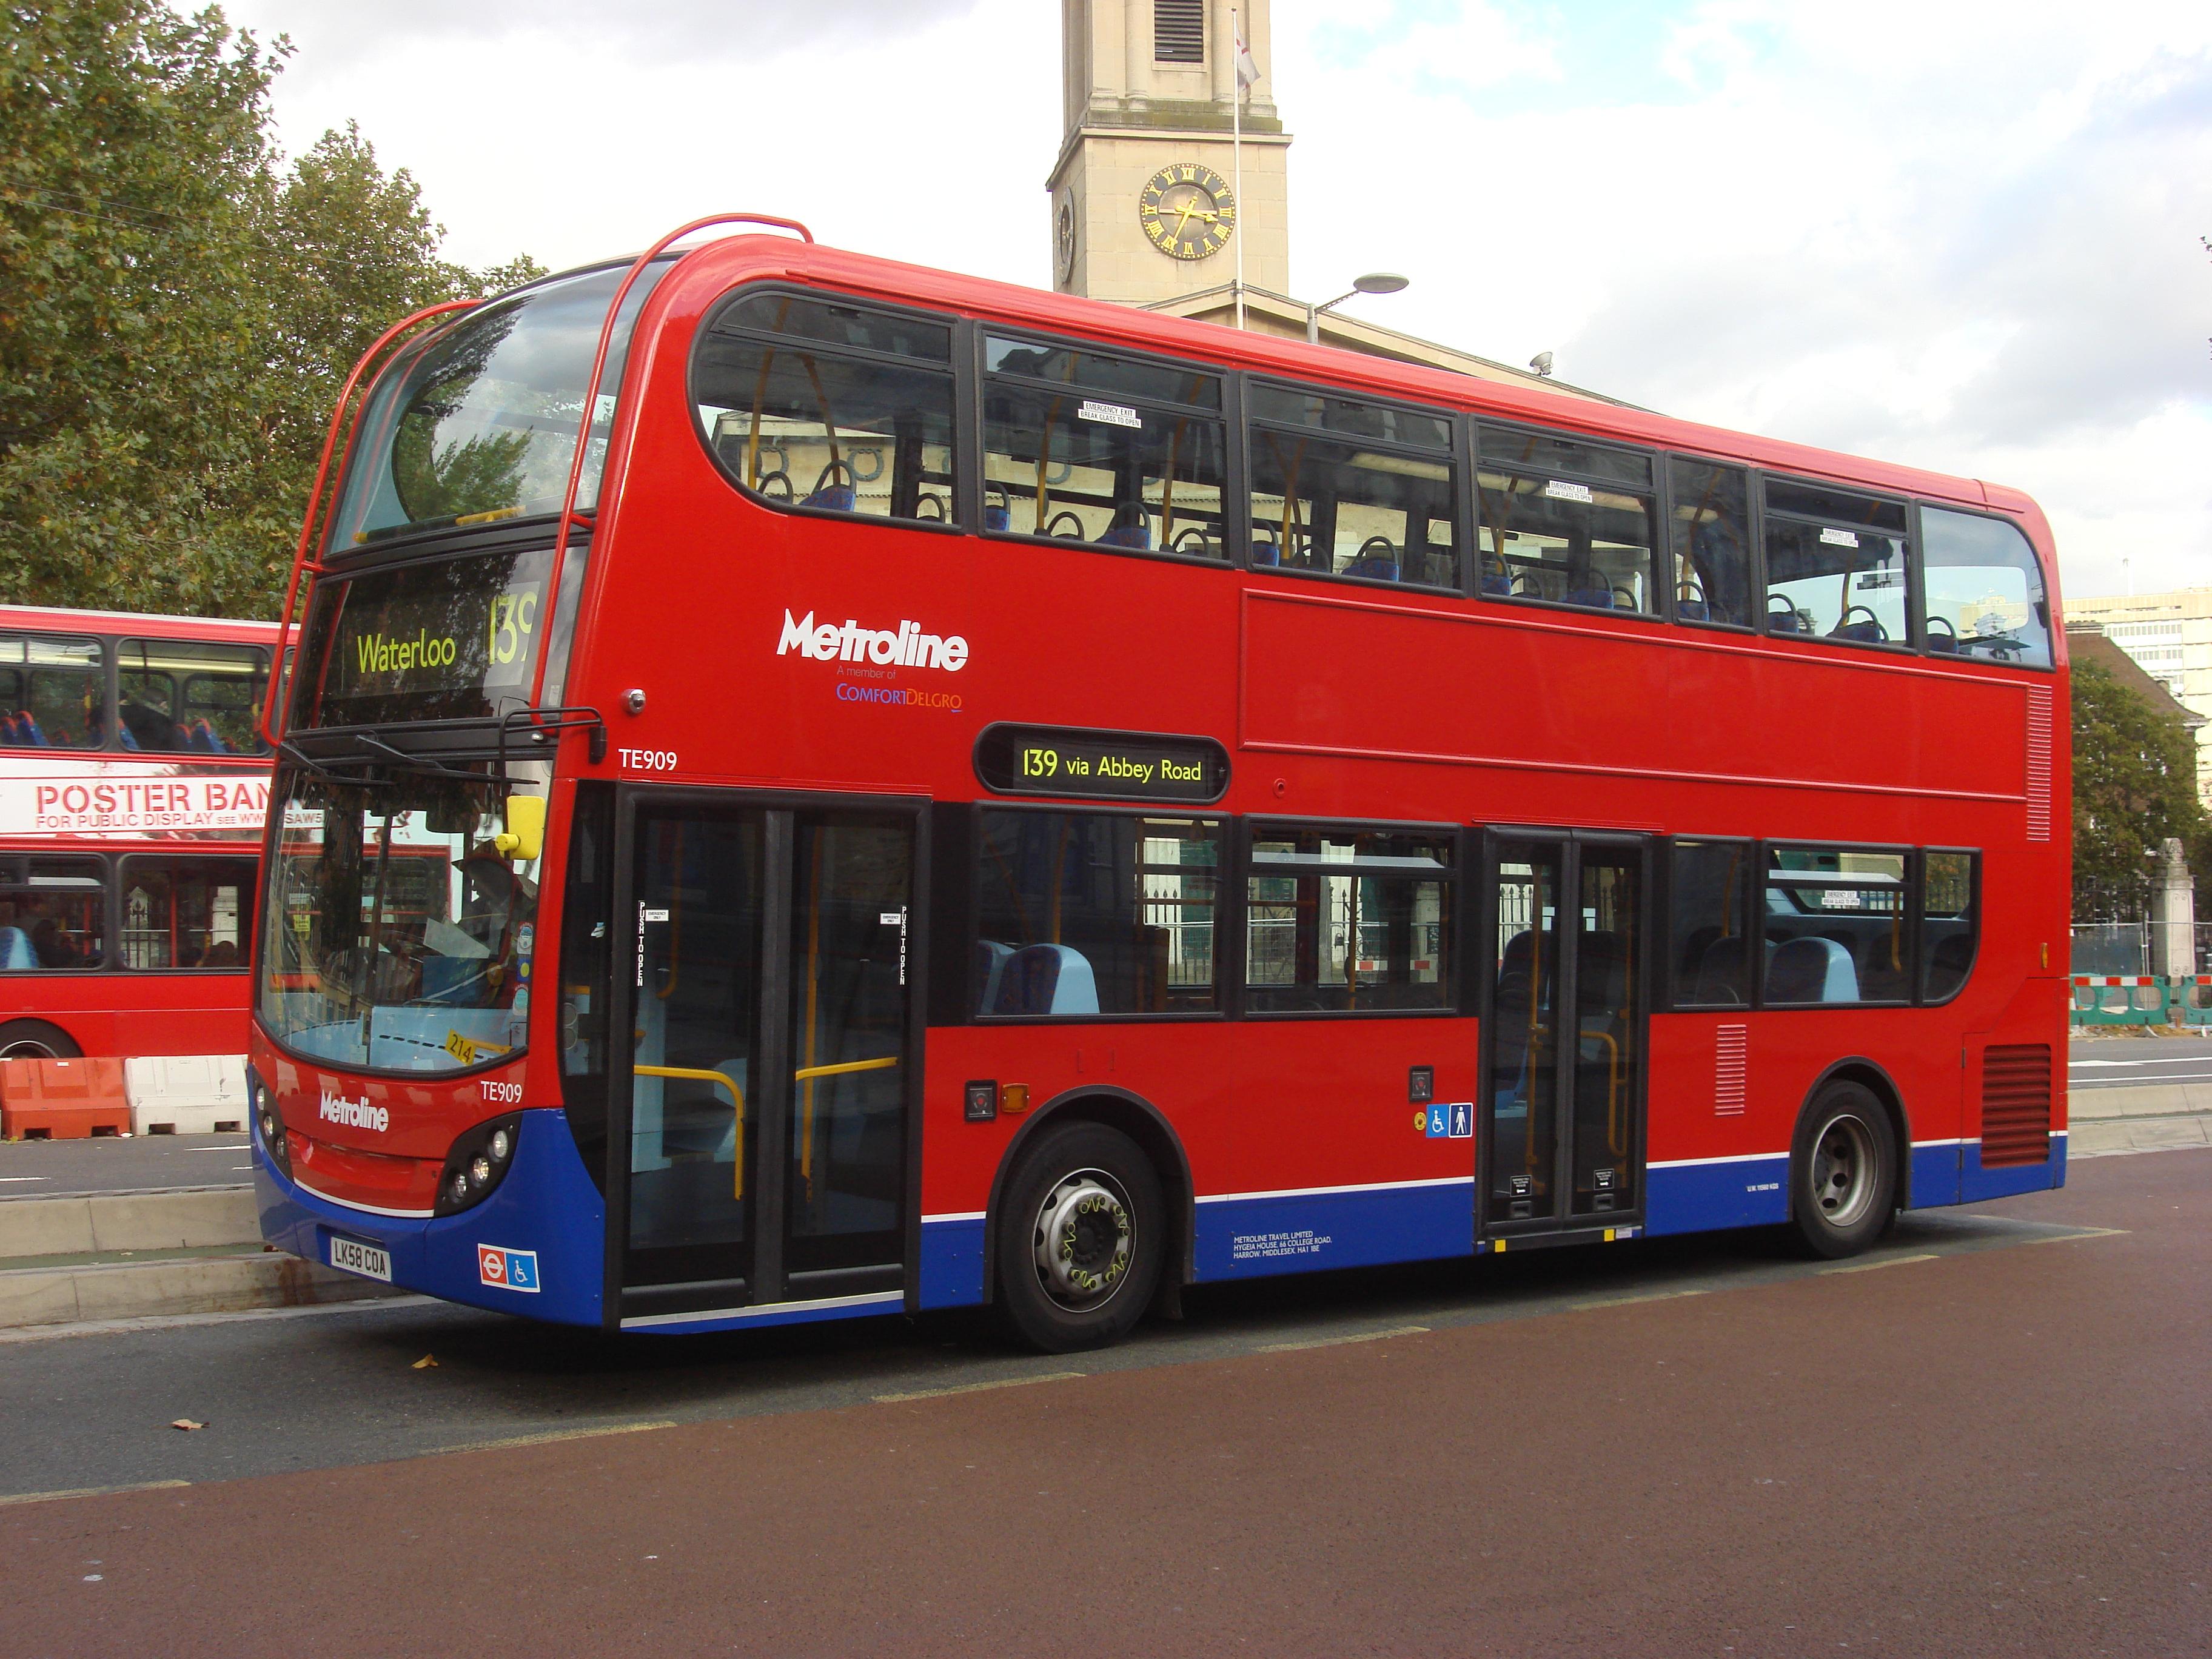 FileLondon Bus route 139 Ajpg 3648x2736